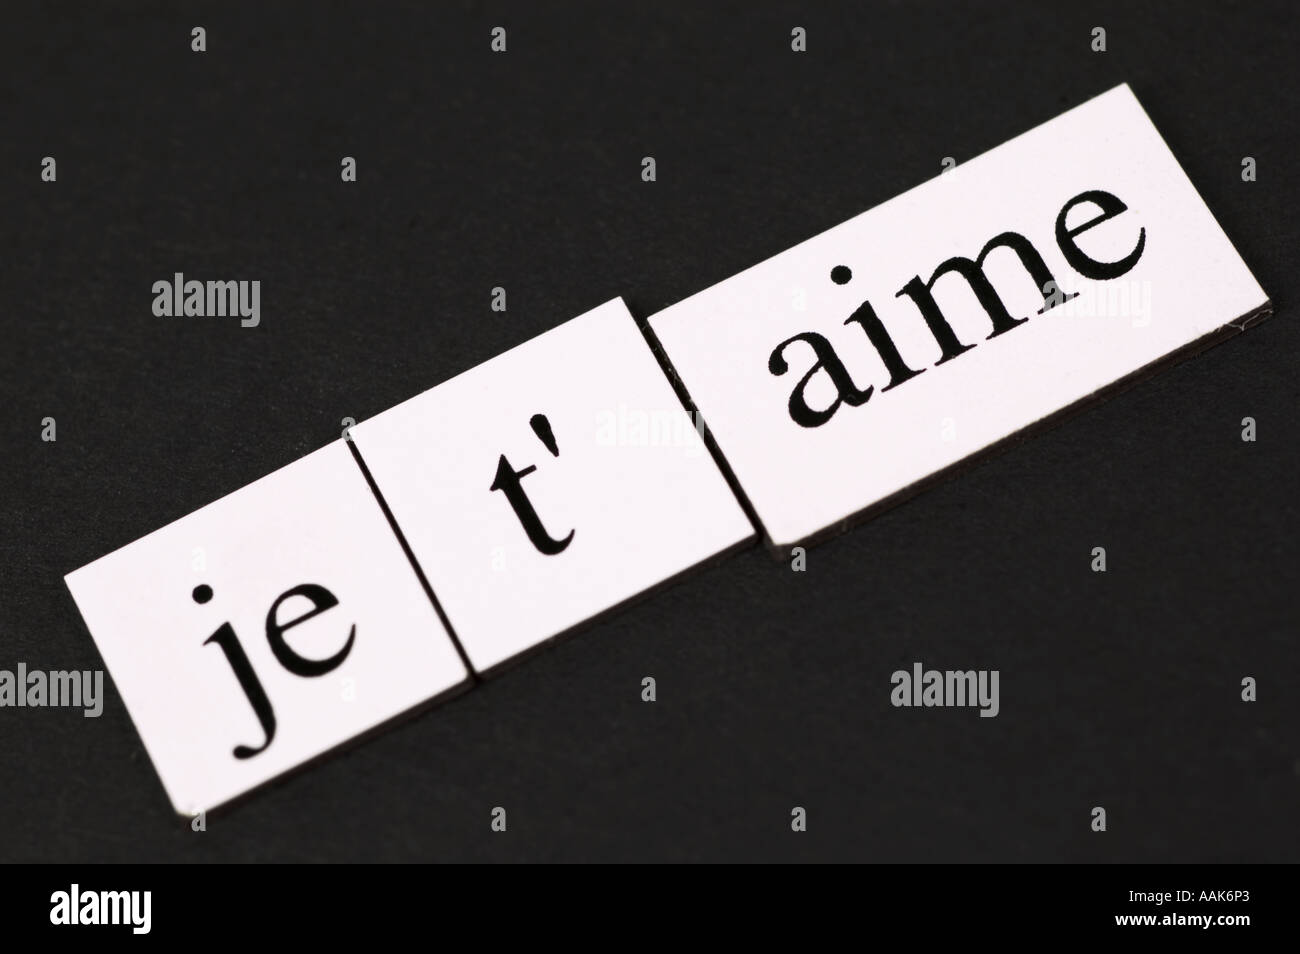 Nevera magnética deletrear palabras Je t'aime Imagen De Stock